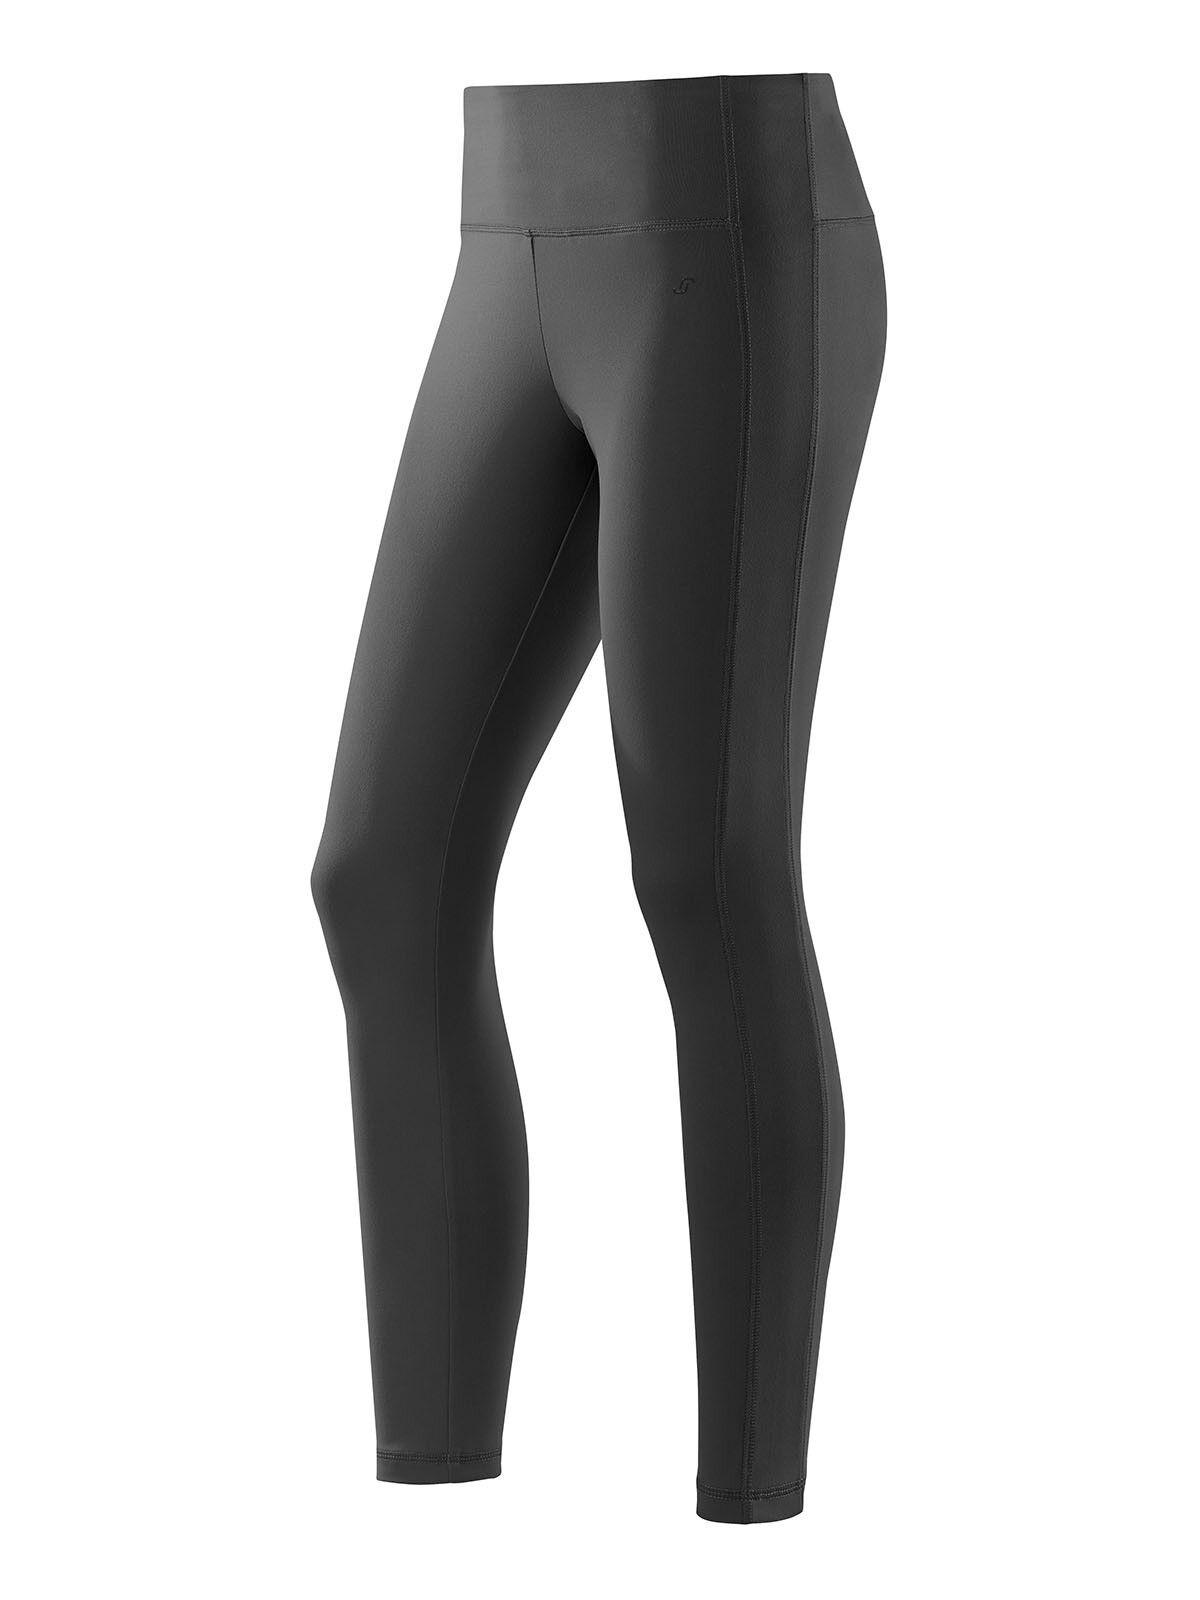 Joy - Bodyfit - Damen Sport Hose mit Shaping-Effekt, Michella (30141)